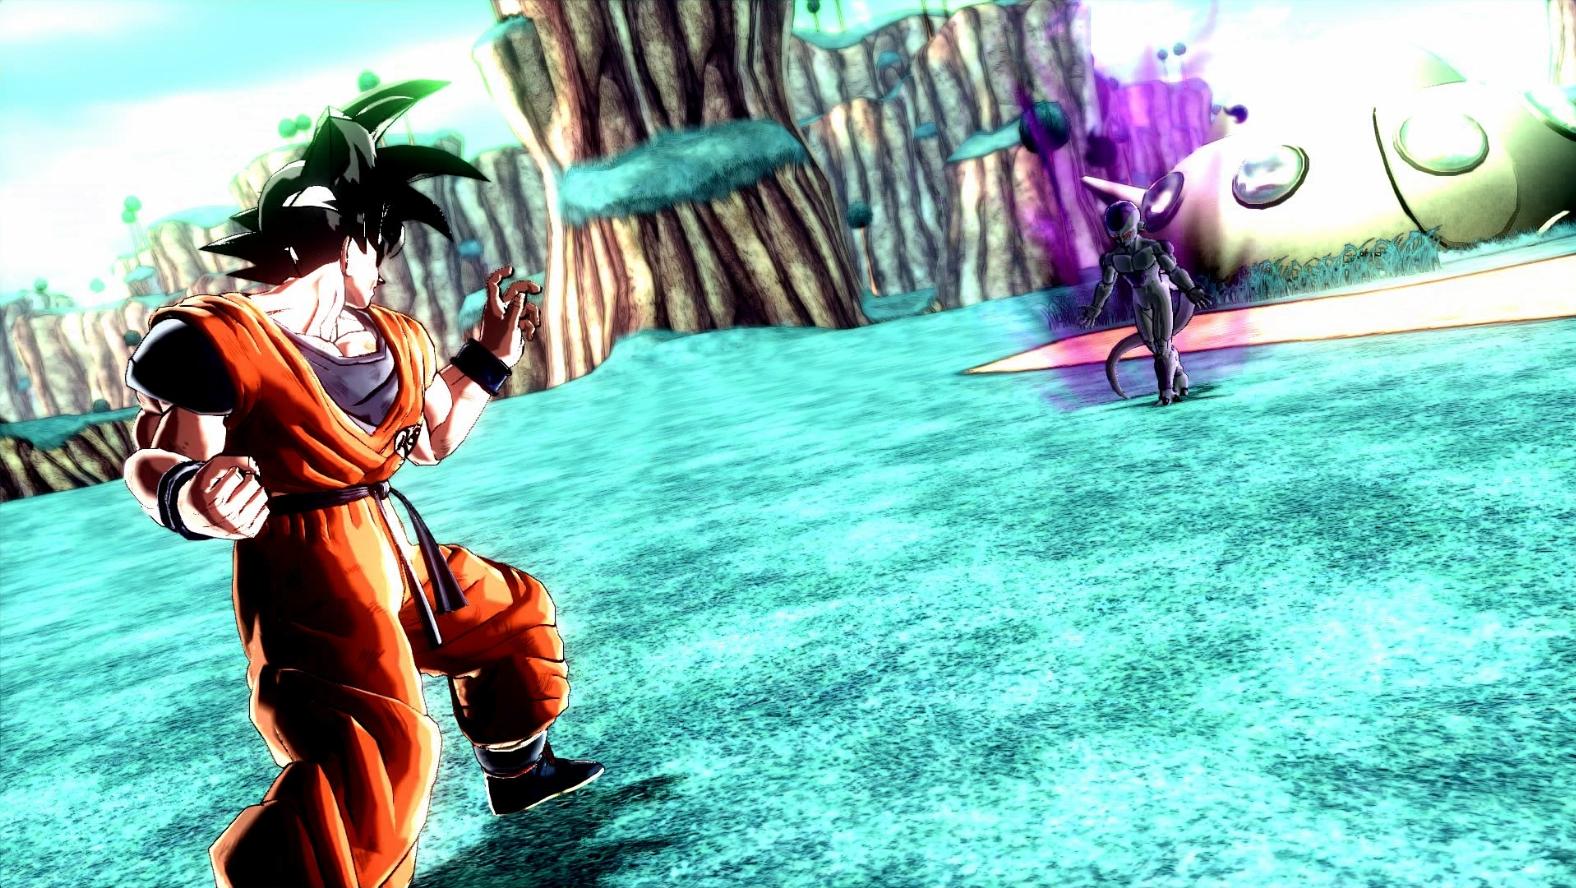 Dragon Ball Xenoverse Ya Se Puede Descargar En Xbox One 3djuegos